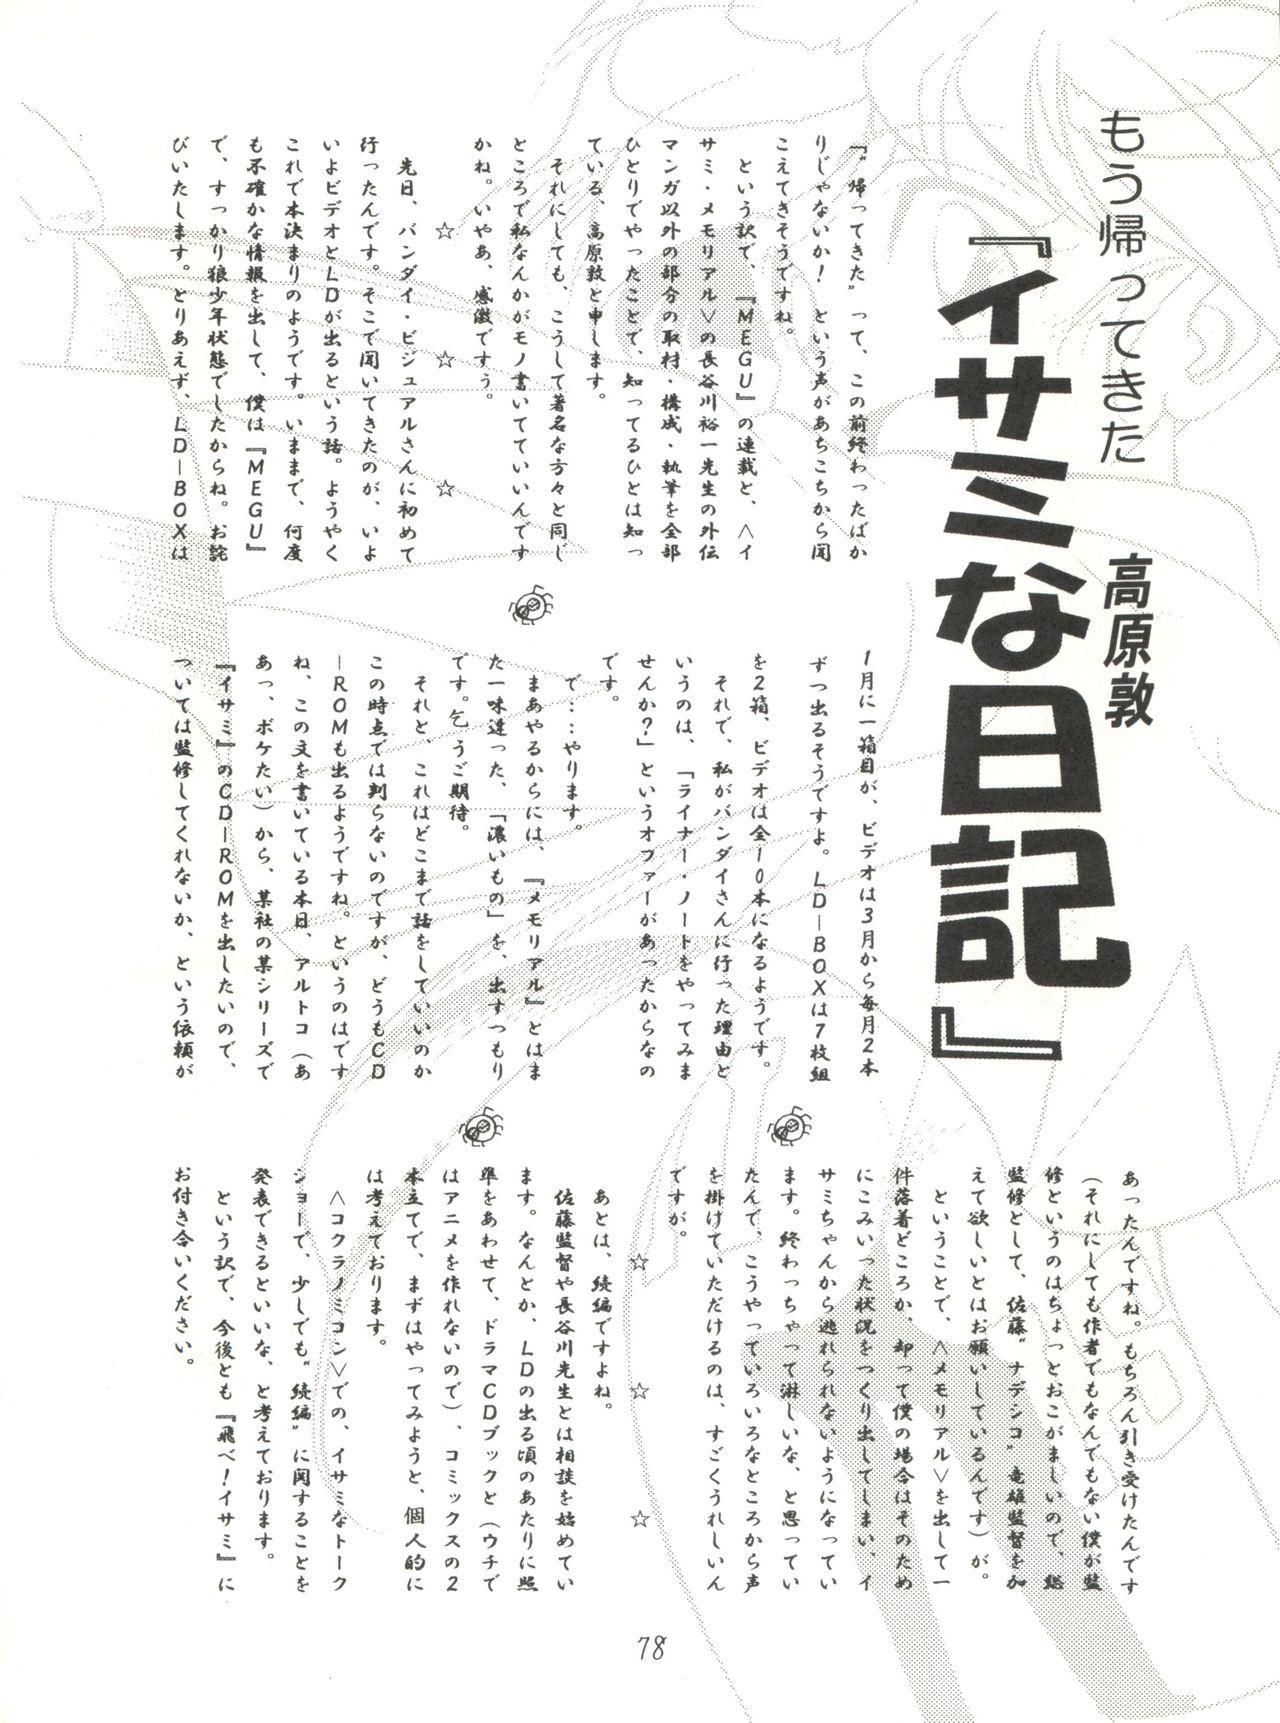 Heart o Migakukkya Nai 77